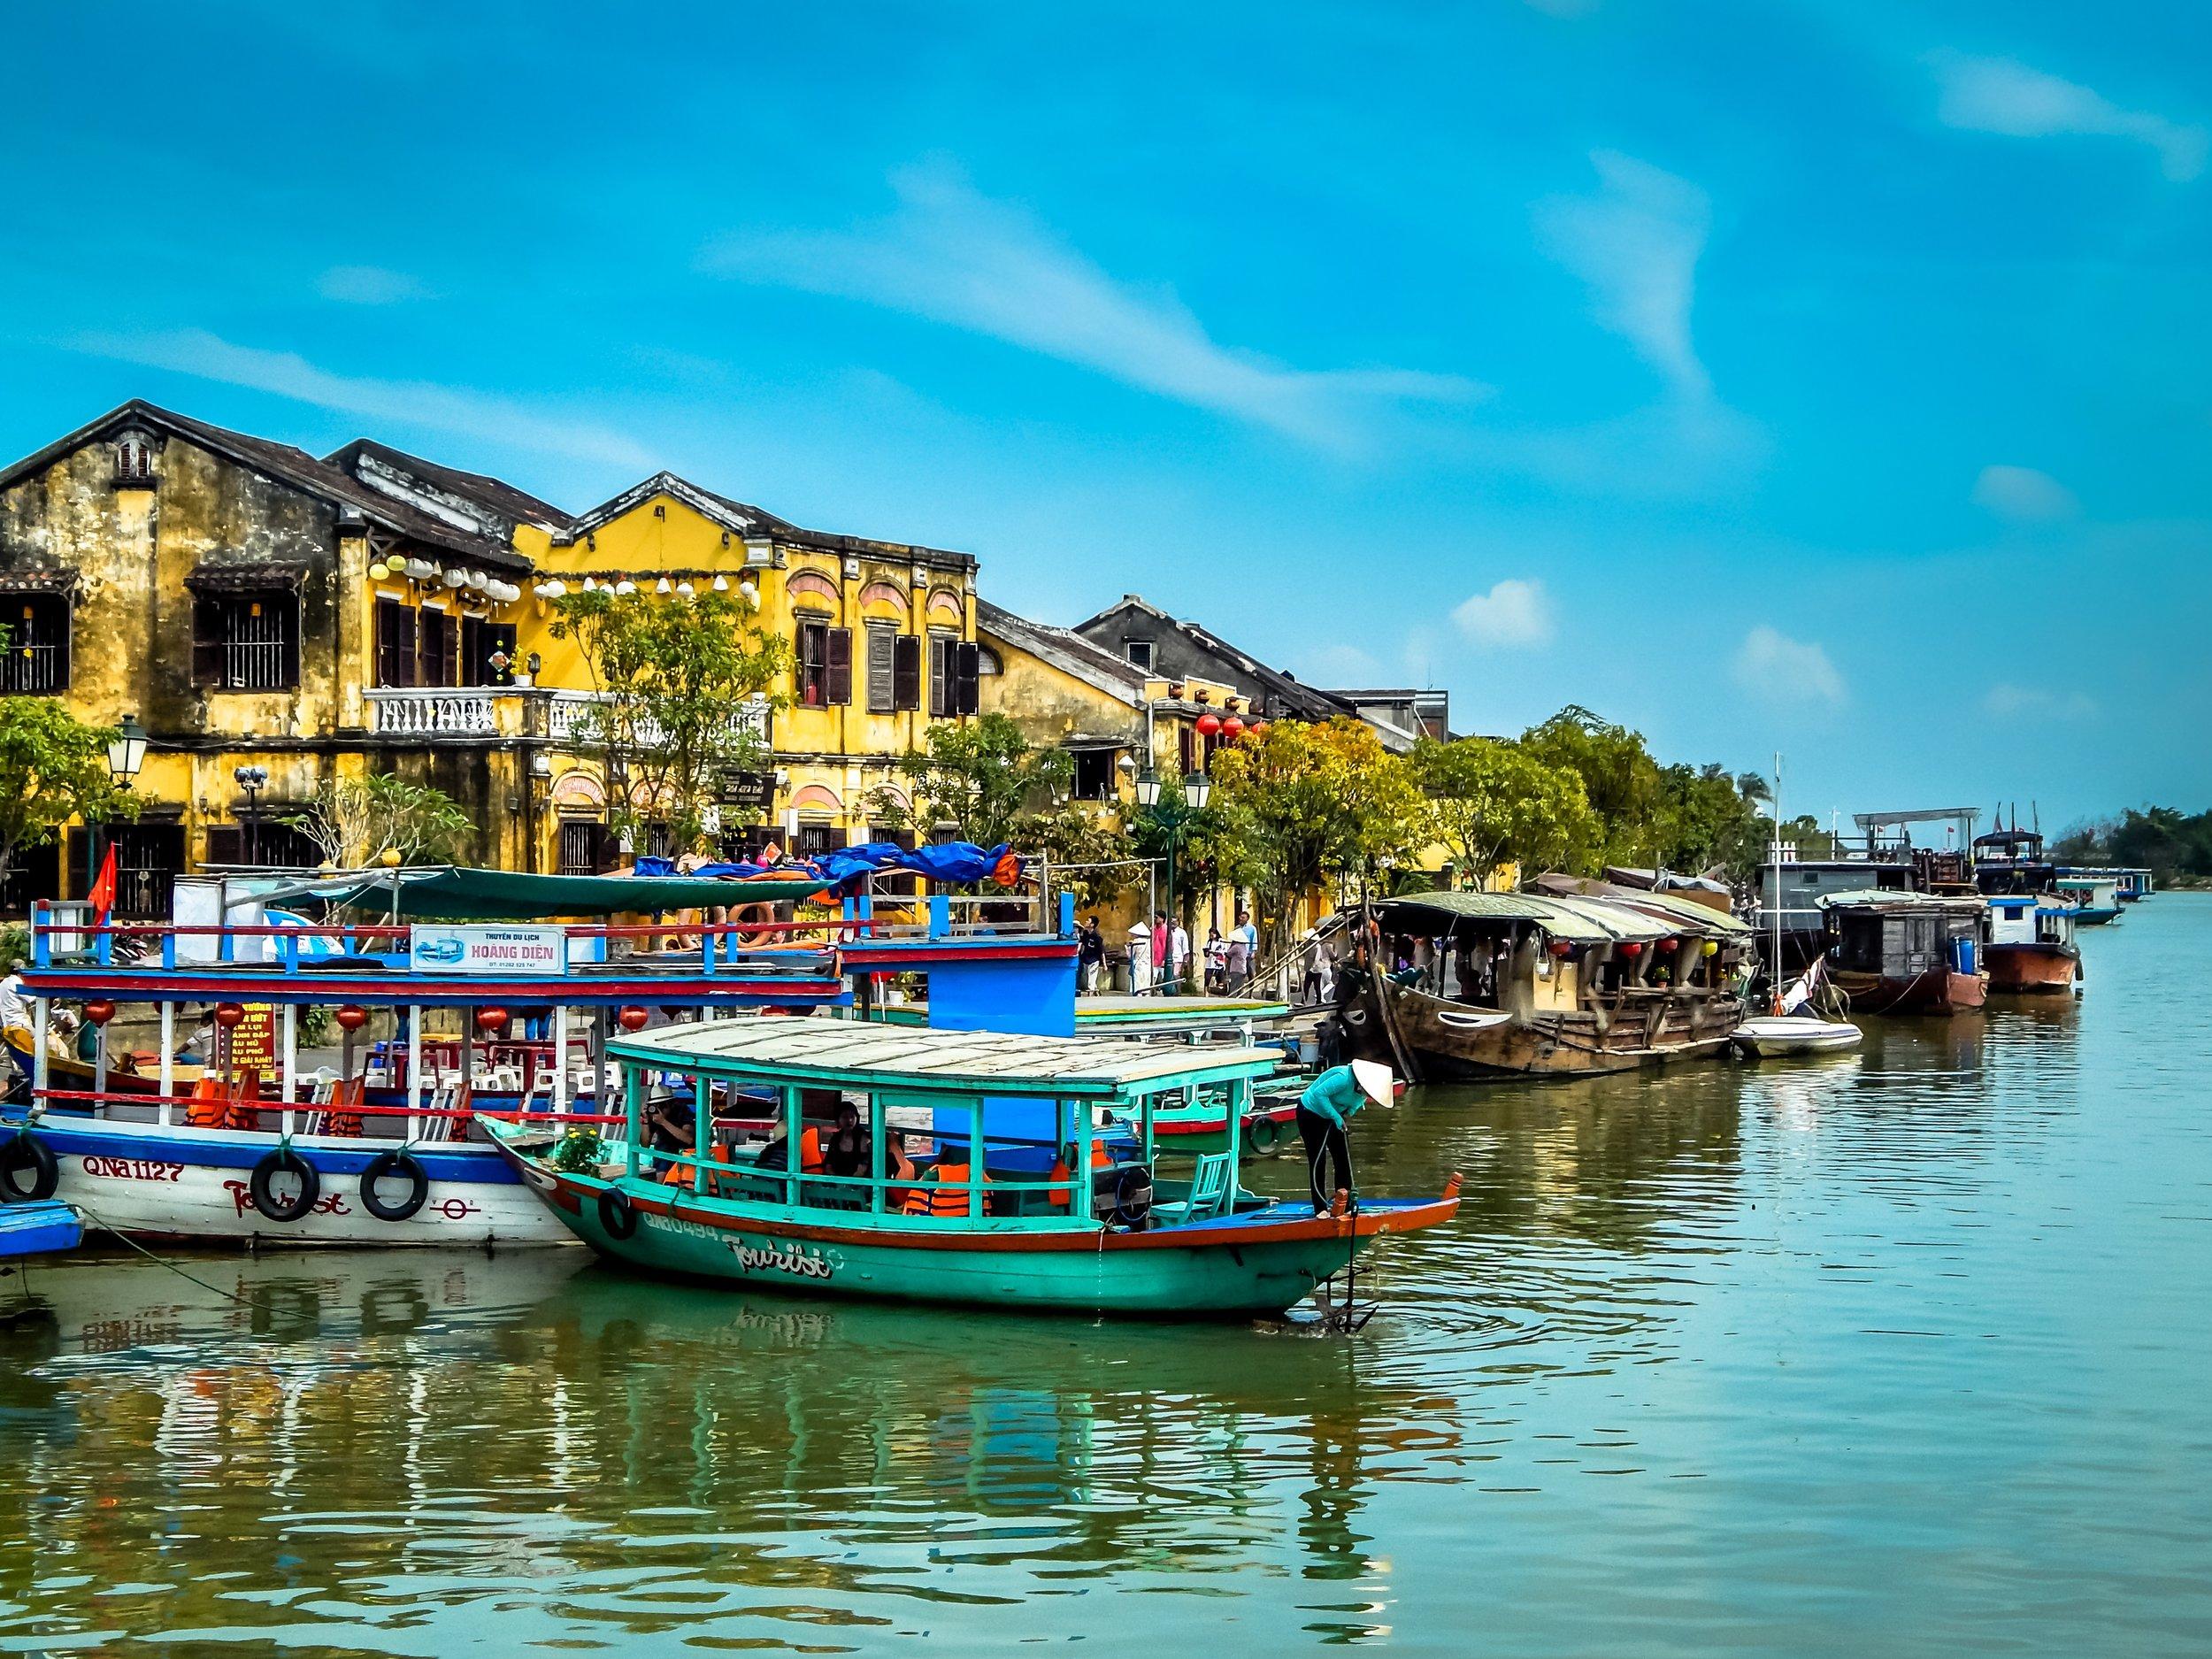 3 Weeks in Vietnam - What to do in Hoi An, Vietnam